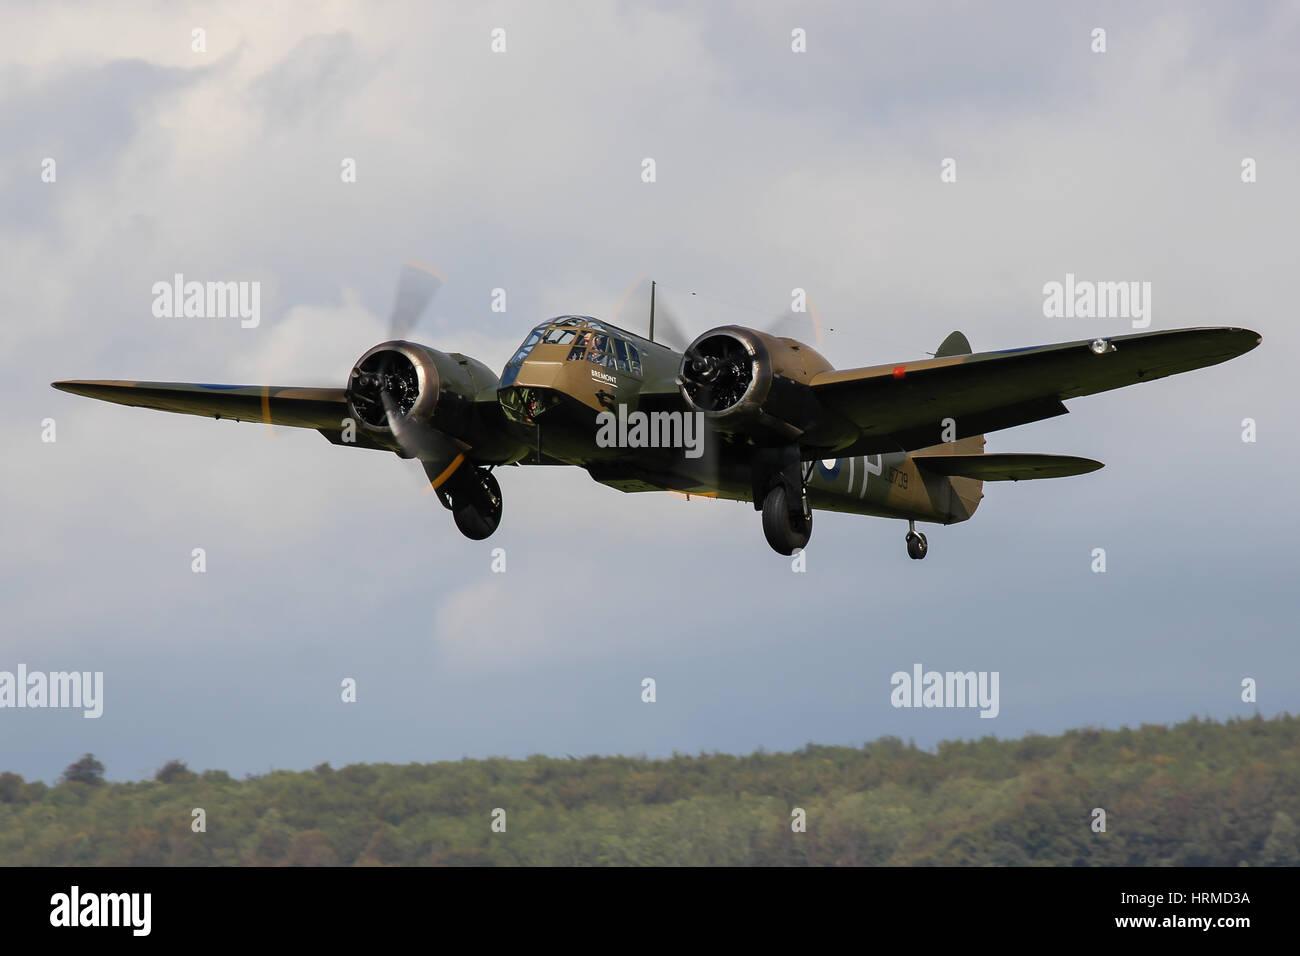 Aircraft Restoration Company's Bristol Blenheim MK If L6739 departs Goodwood Aerodrome, UK - Stock Image